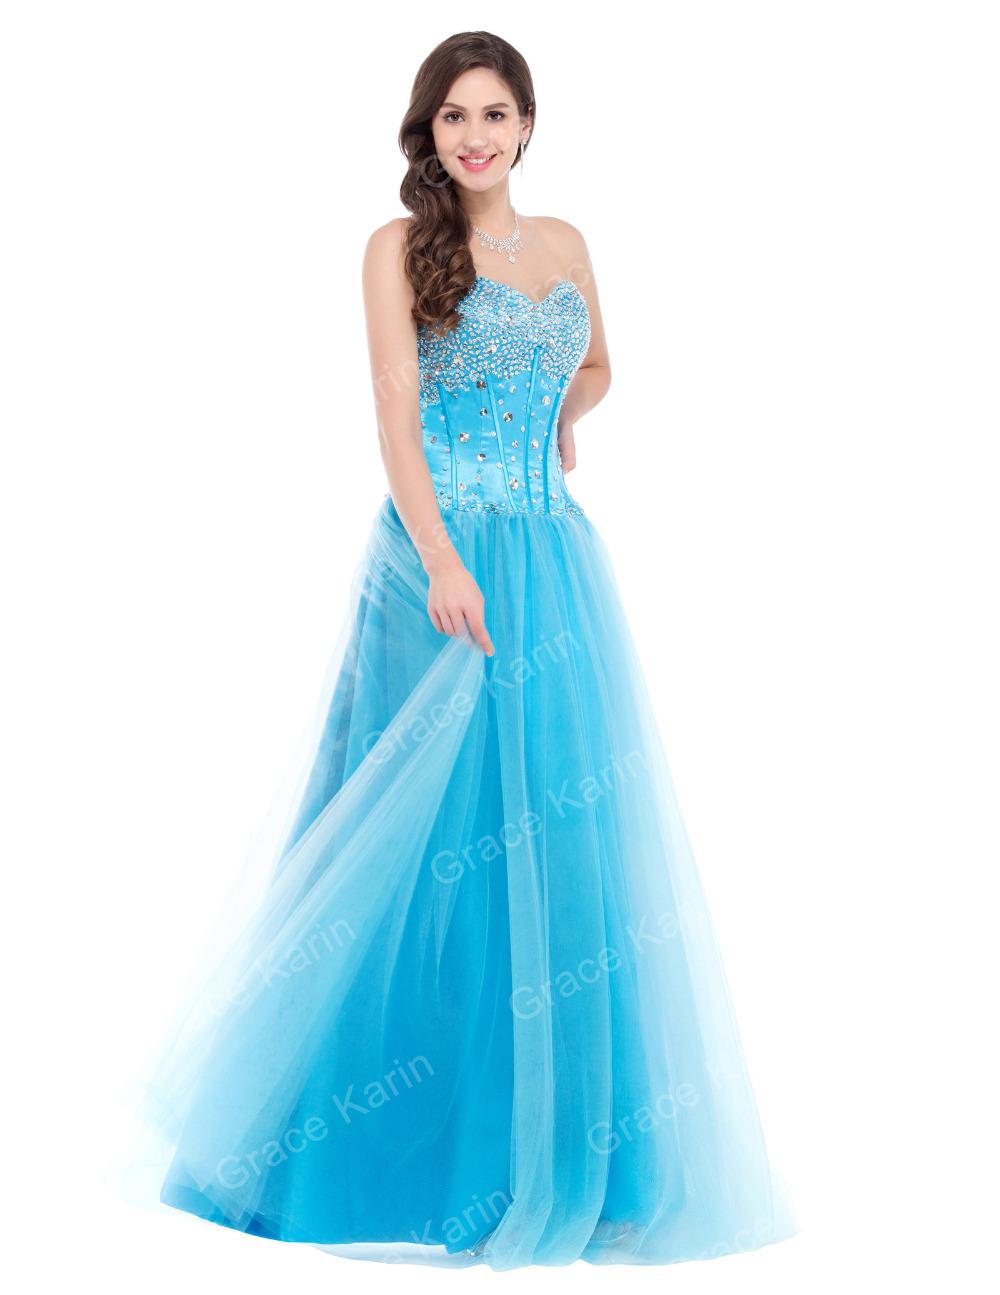 Prom dress finder 2016